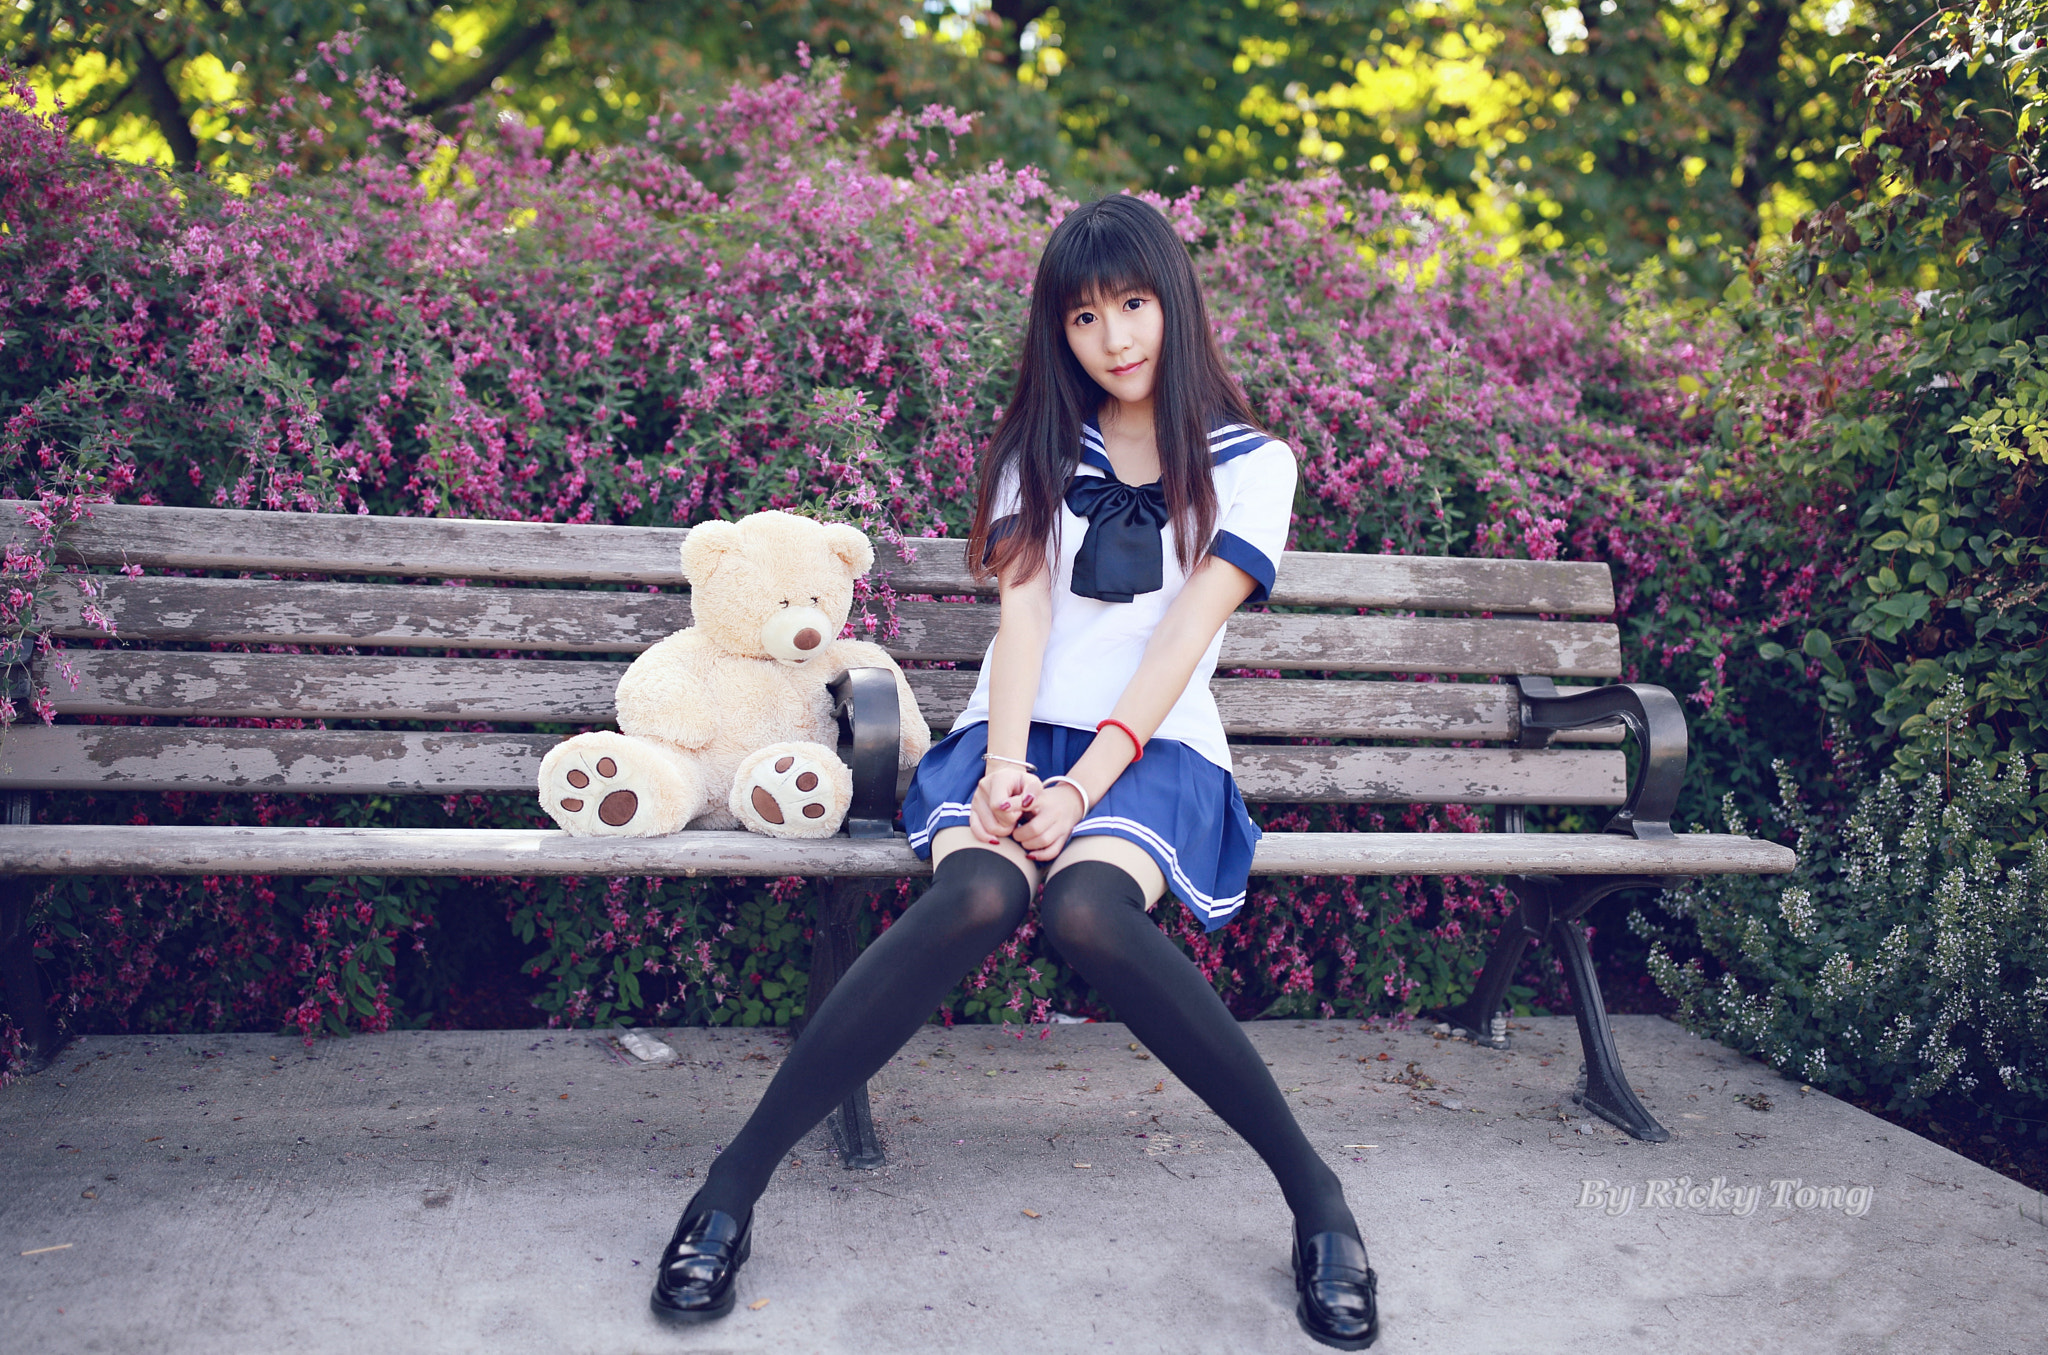 People 2048x1355 women model brunette looking at viewer thigh-highs knee-highs stockings depth of field Asian school uniform teddy bears bench